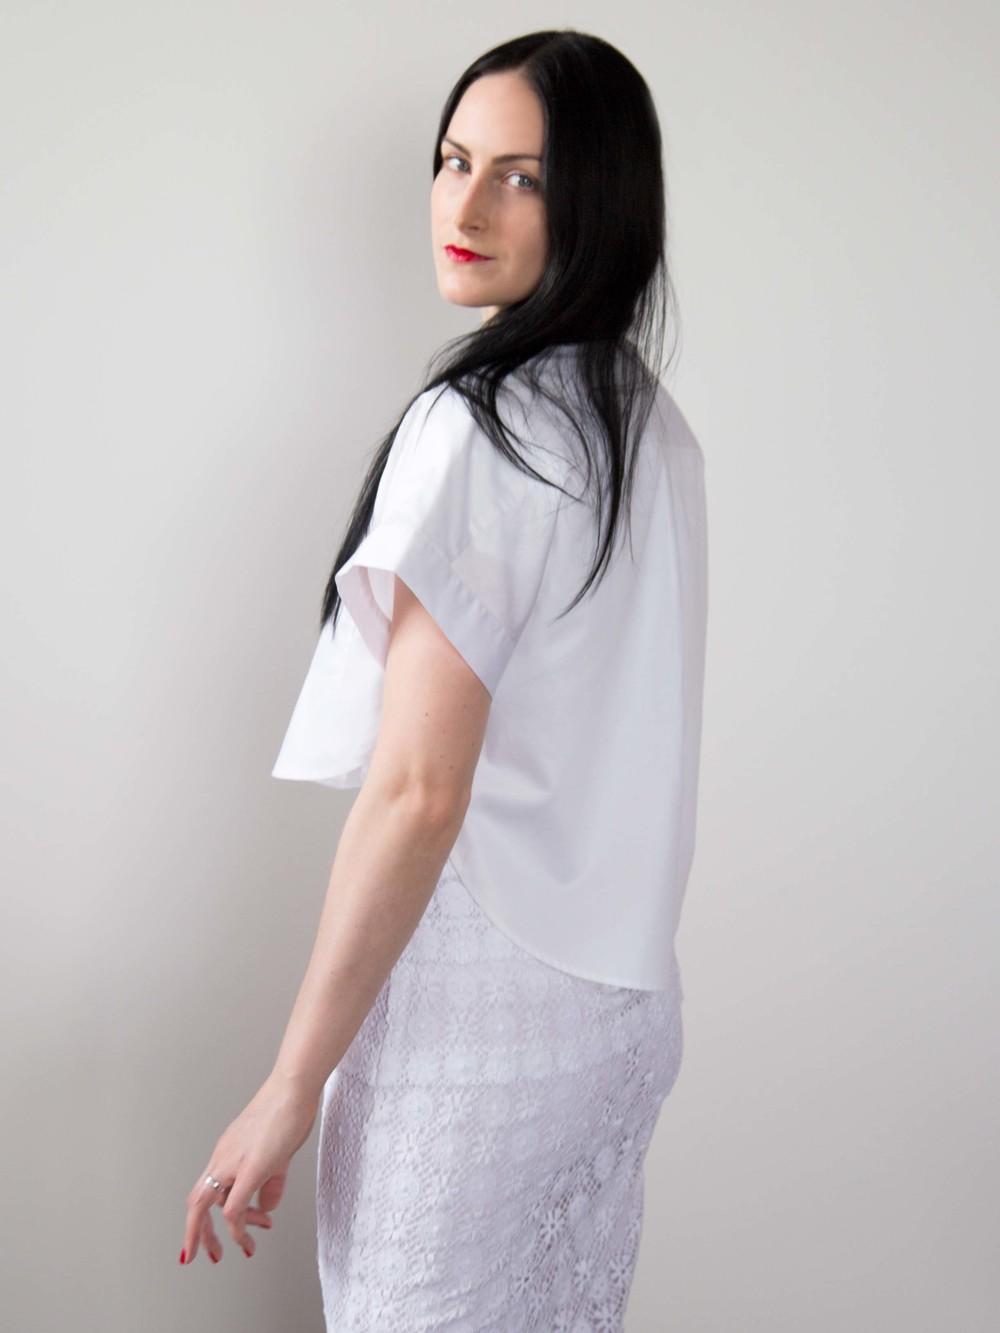 LOVER® White Crop Shirt, Burberry Prorsum English Lace V-Neck Dress